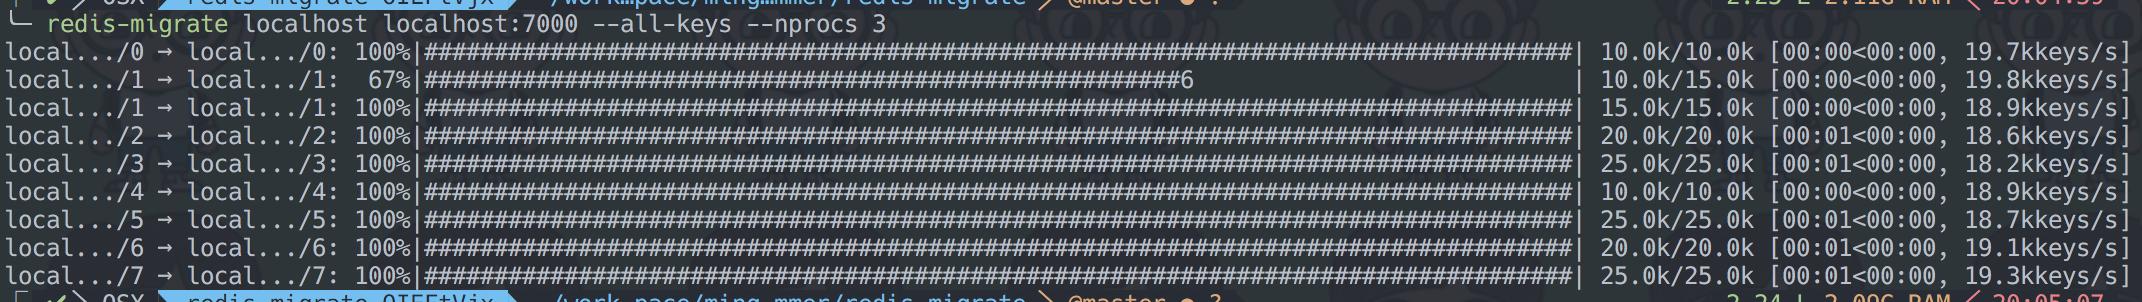 screenshot 2018-09-17 20 05 24